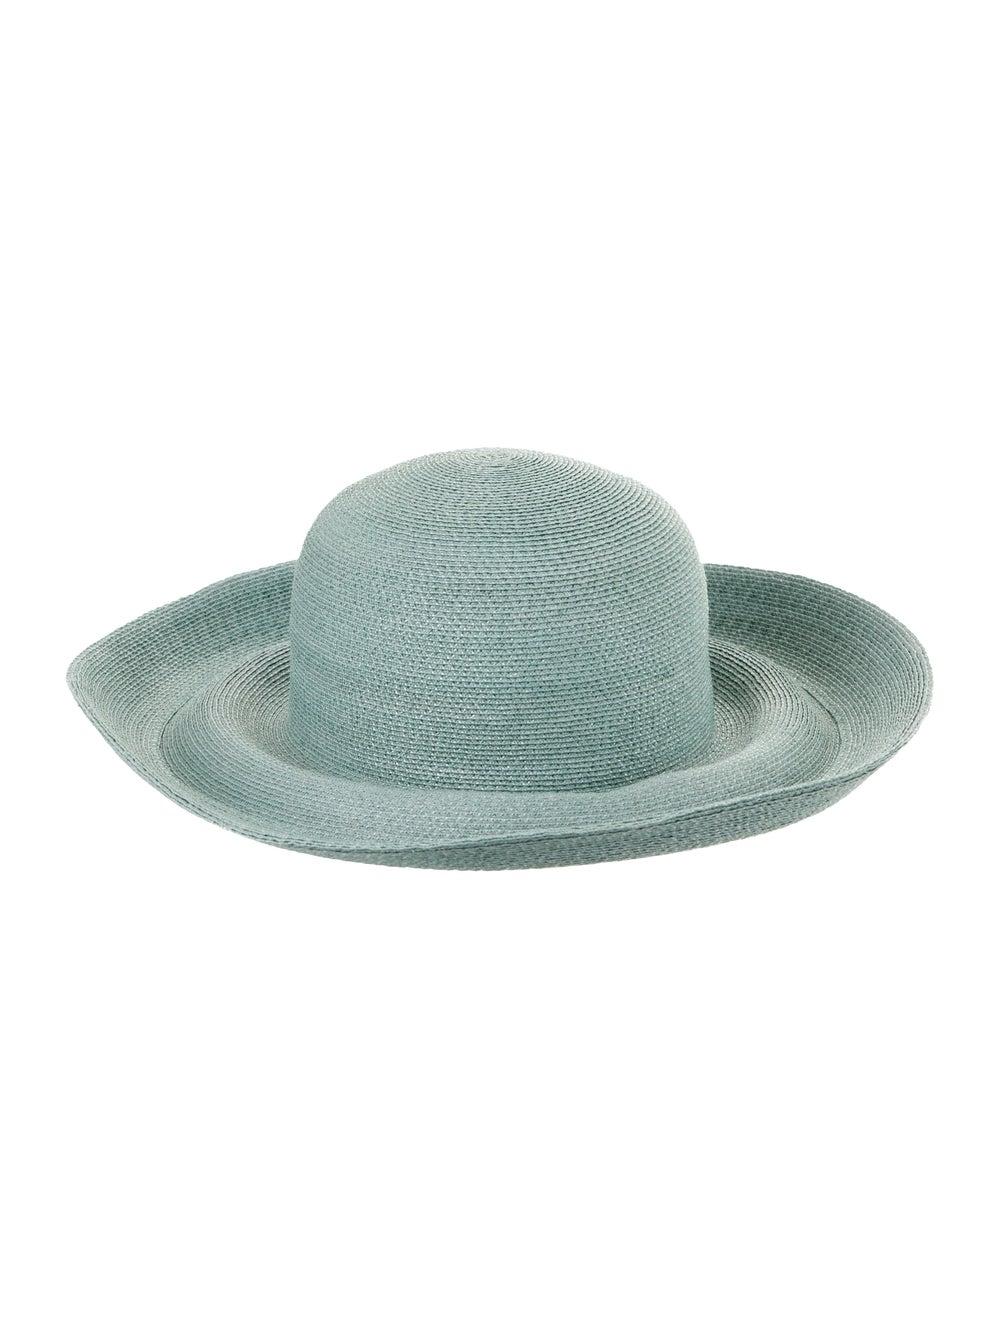 Patricia Underwood Straw Wide Brim Hat - image 2